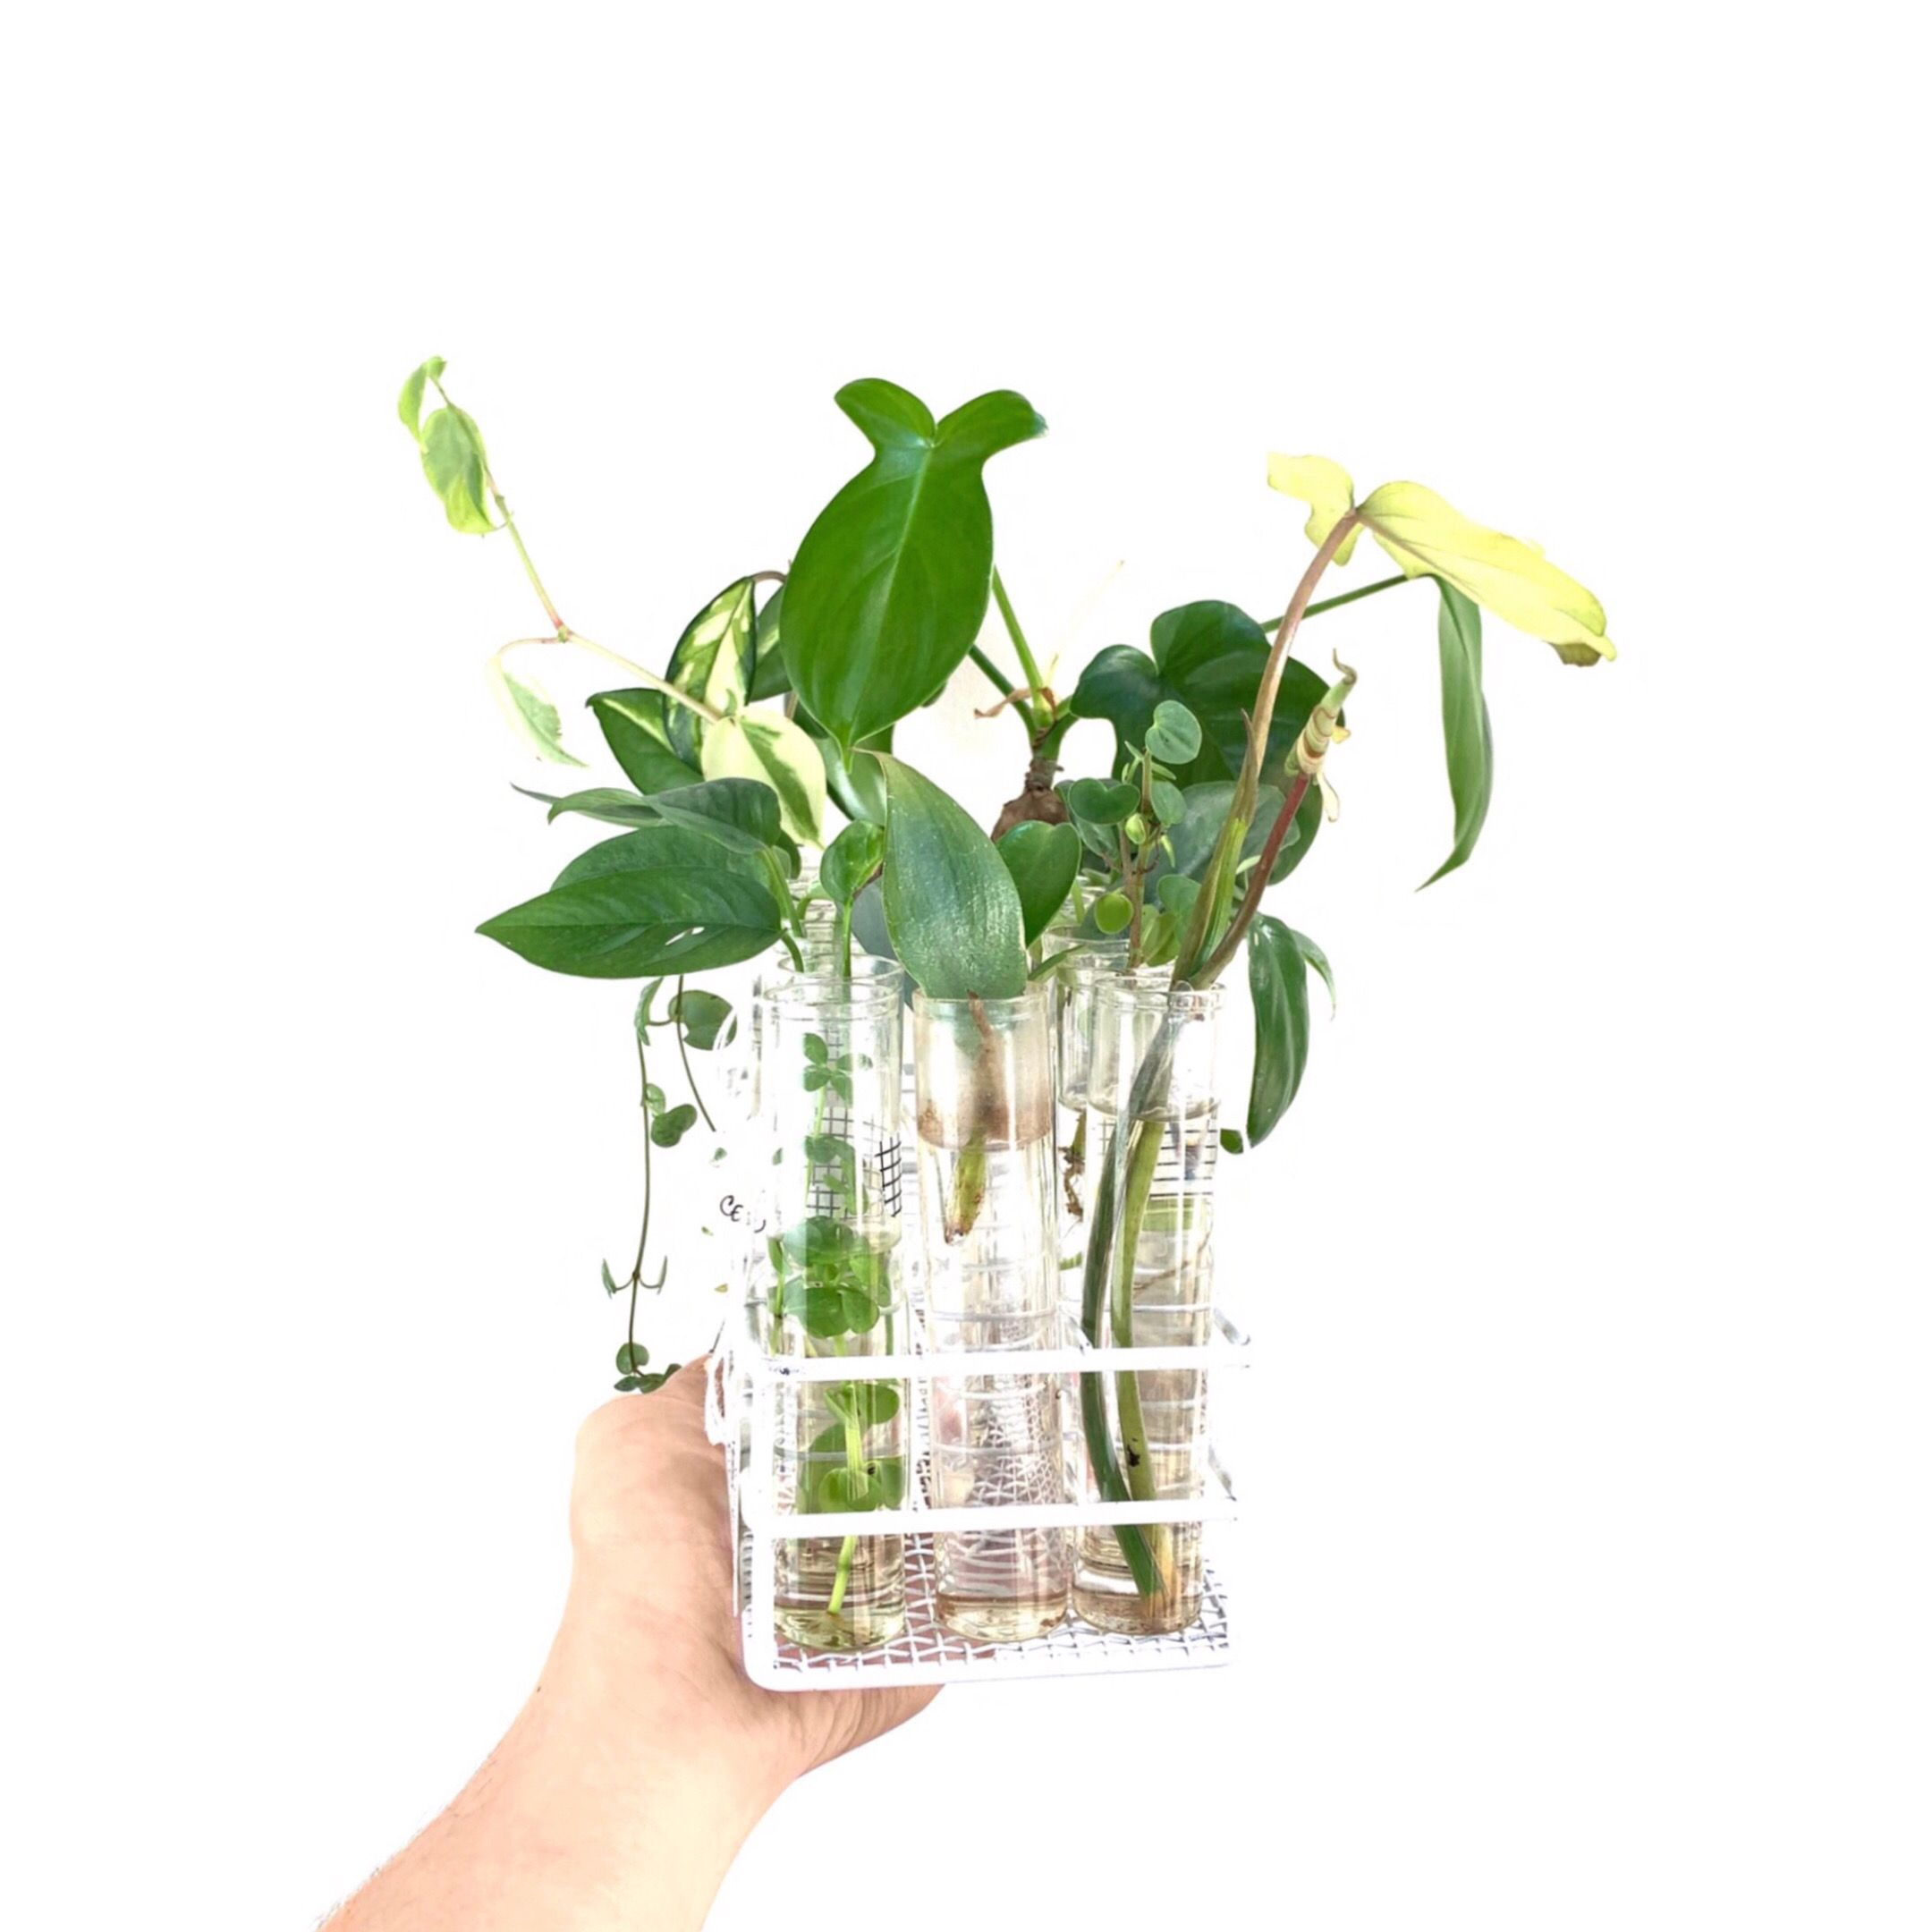 Propagating Cuttings  #propagationstation #PhilodendronMayoi #plantcuttings #plantswap #propagate #philodendronhastatum #cebublue #monsteraperu #currentlypropagating #propagation #propagating #Planttrade #rareplants #tradeplants #houseplantcommunity #plantenabler #talkplantytome #plantfriends #plantcommunity #indoorplants  #houseplants #houseplantplantclub #plantcommunity #plantparenthood #planthoarder #flauntyourleaves  #coolplantkids #plantsmakepeoplehappy #urbanjunglebloggers #iplanteven